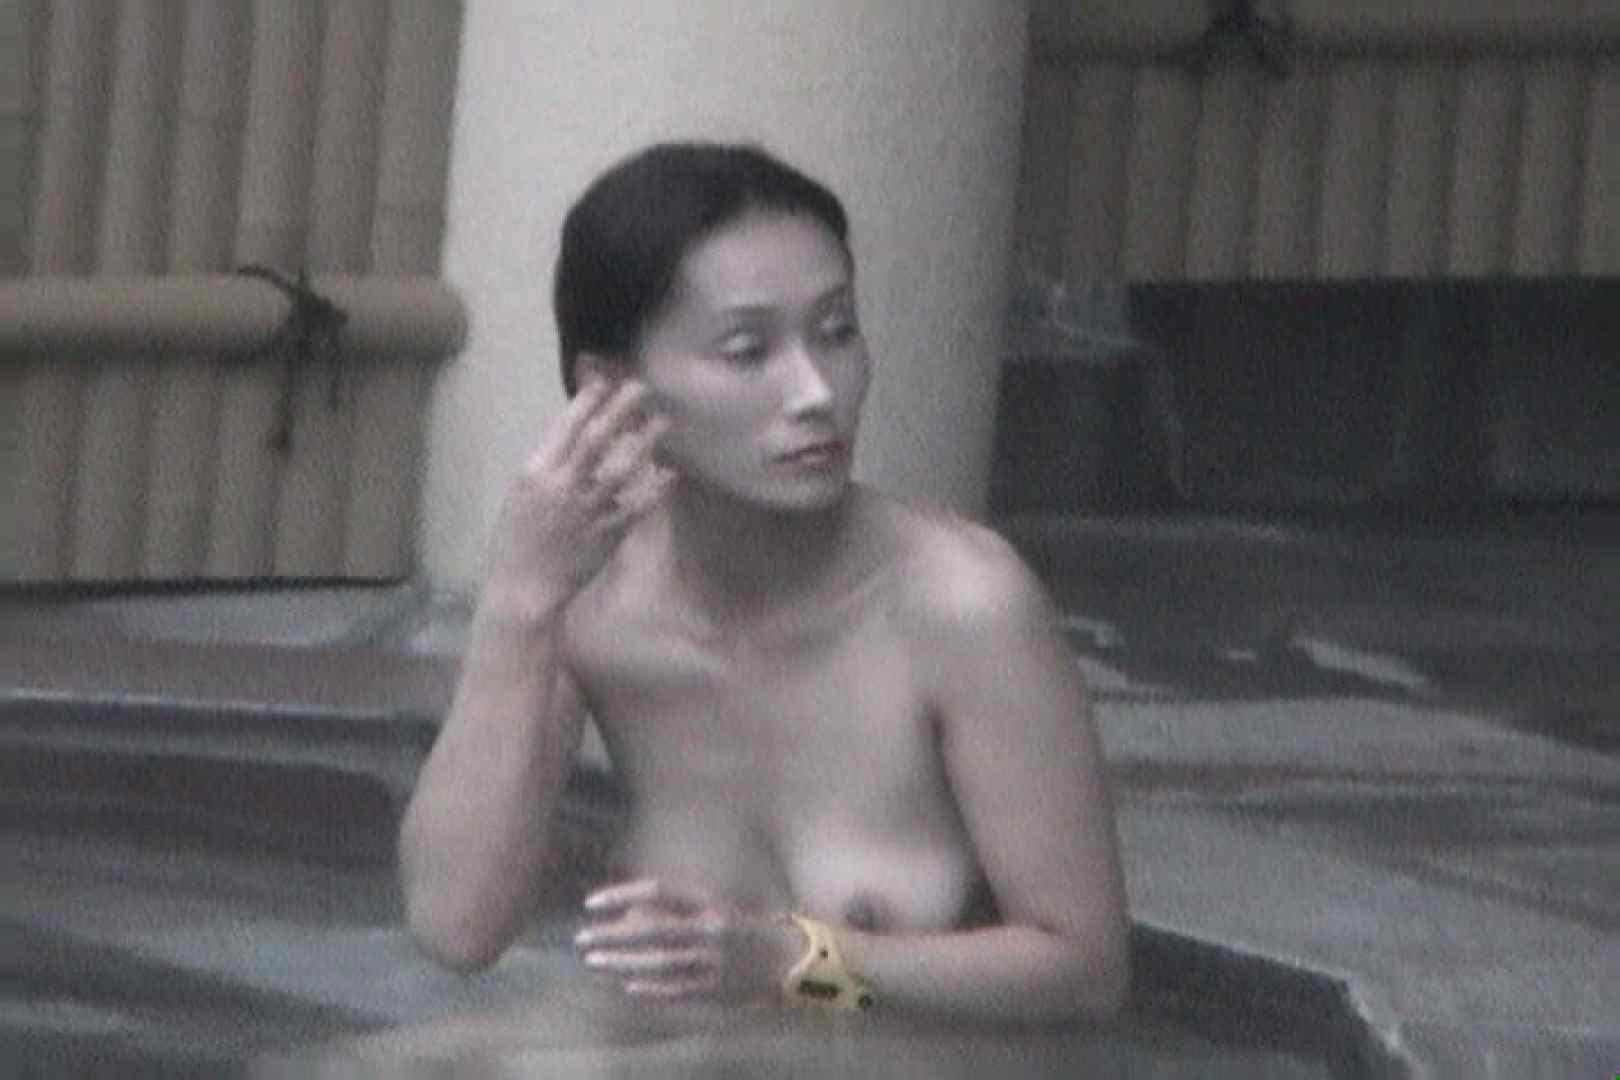 Aquaな露天風呂Vol.557 露天 | OL女体  40連発 10